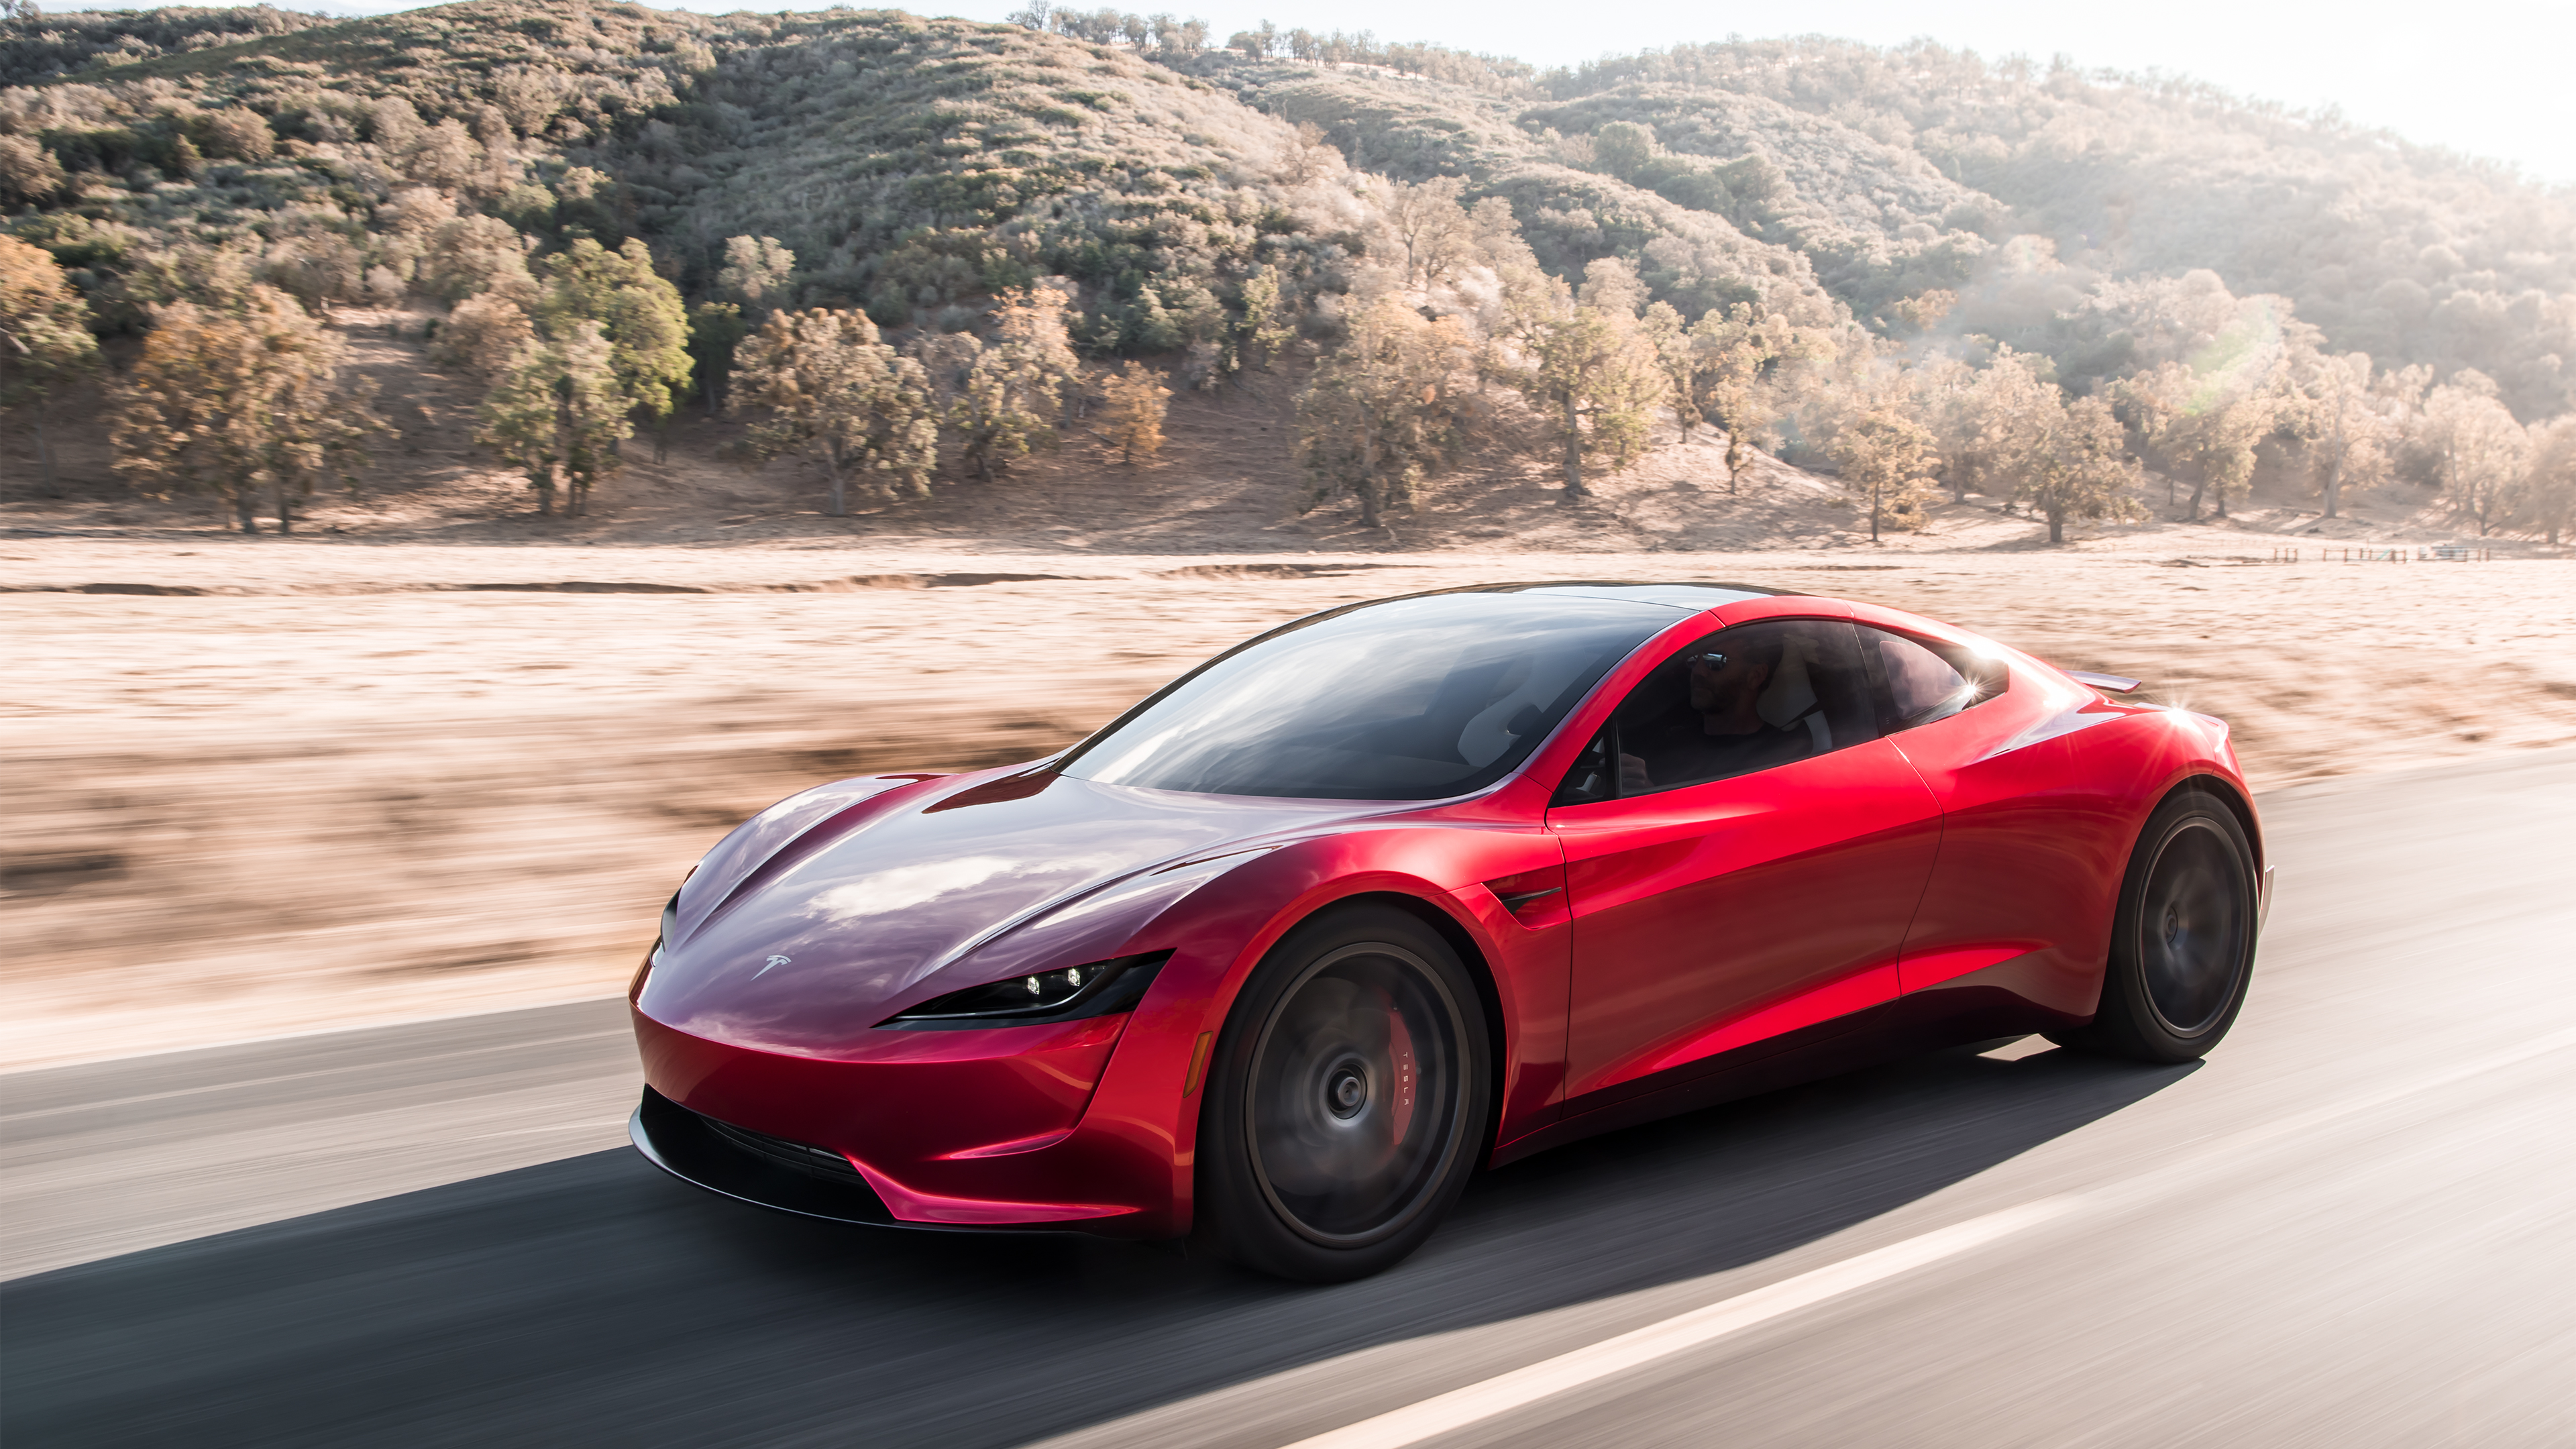 Tesla Roadster - Elon Musk